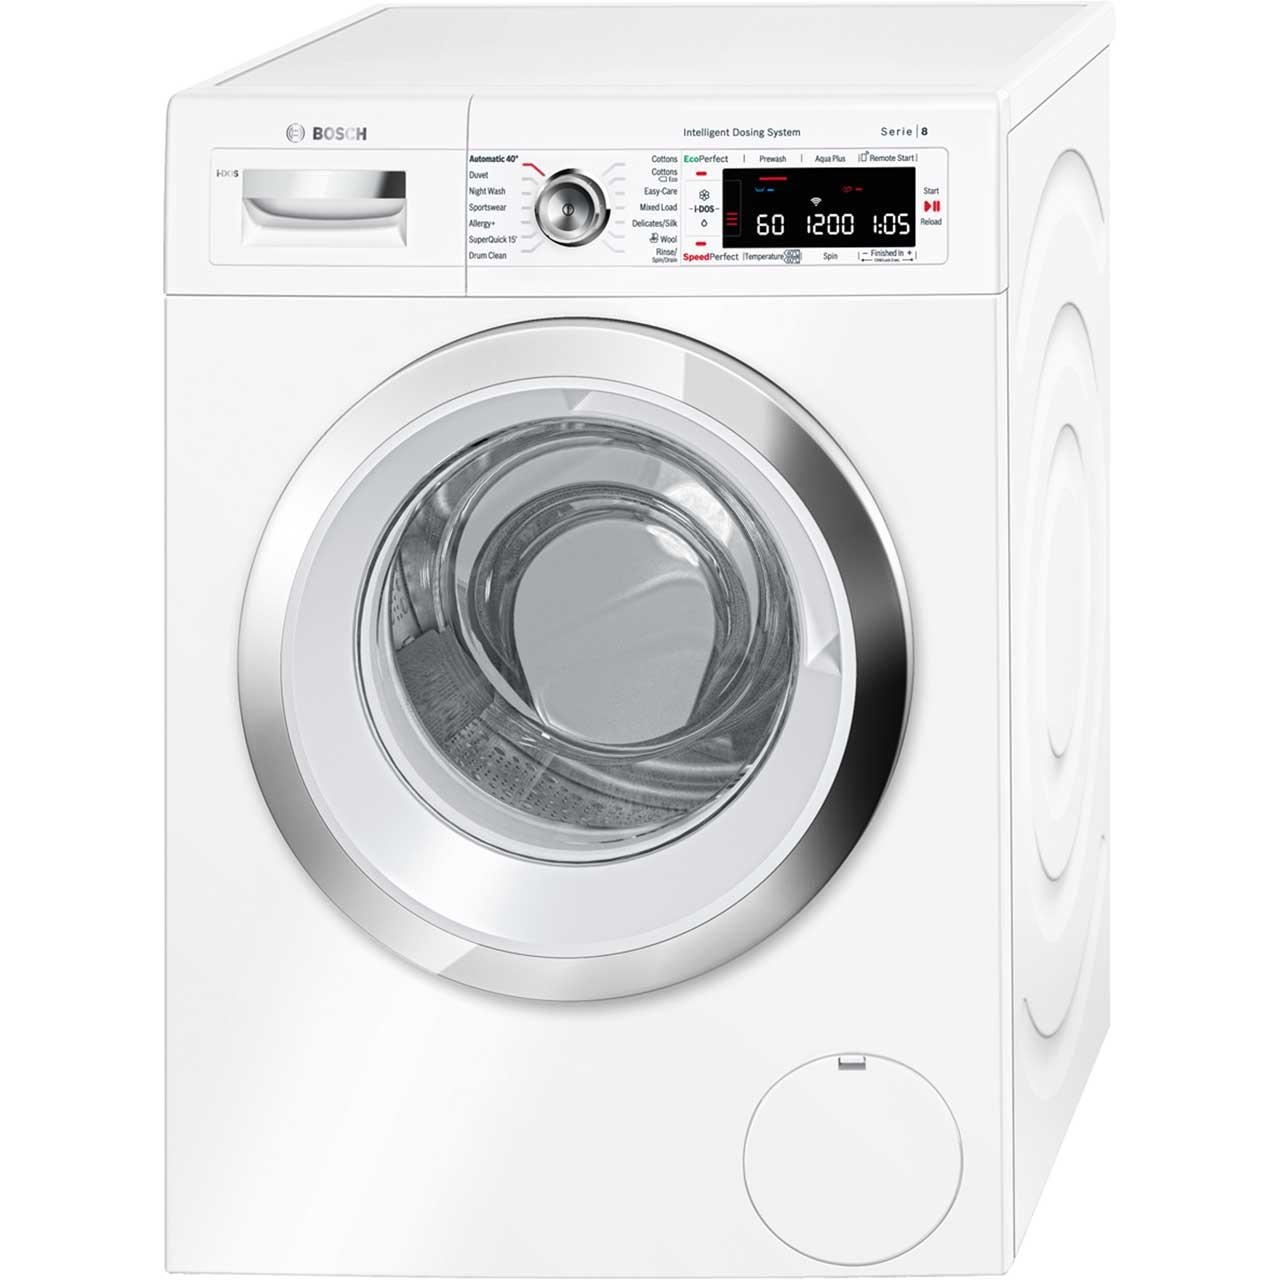 Bosch Serie 8 WAWH8660GB Free Standing Washing Machine in White